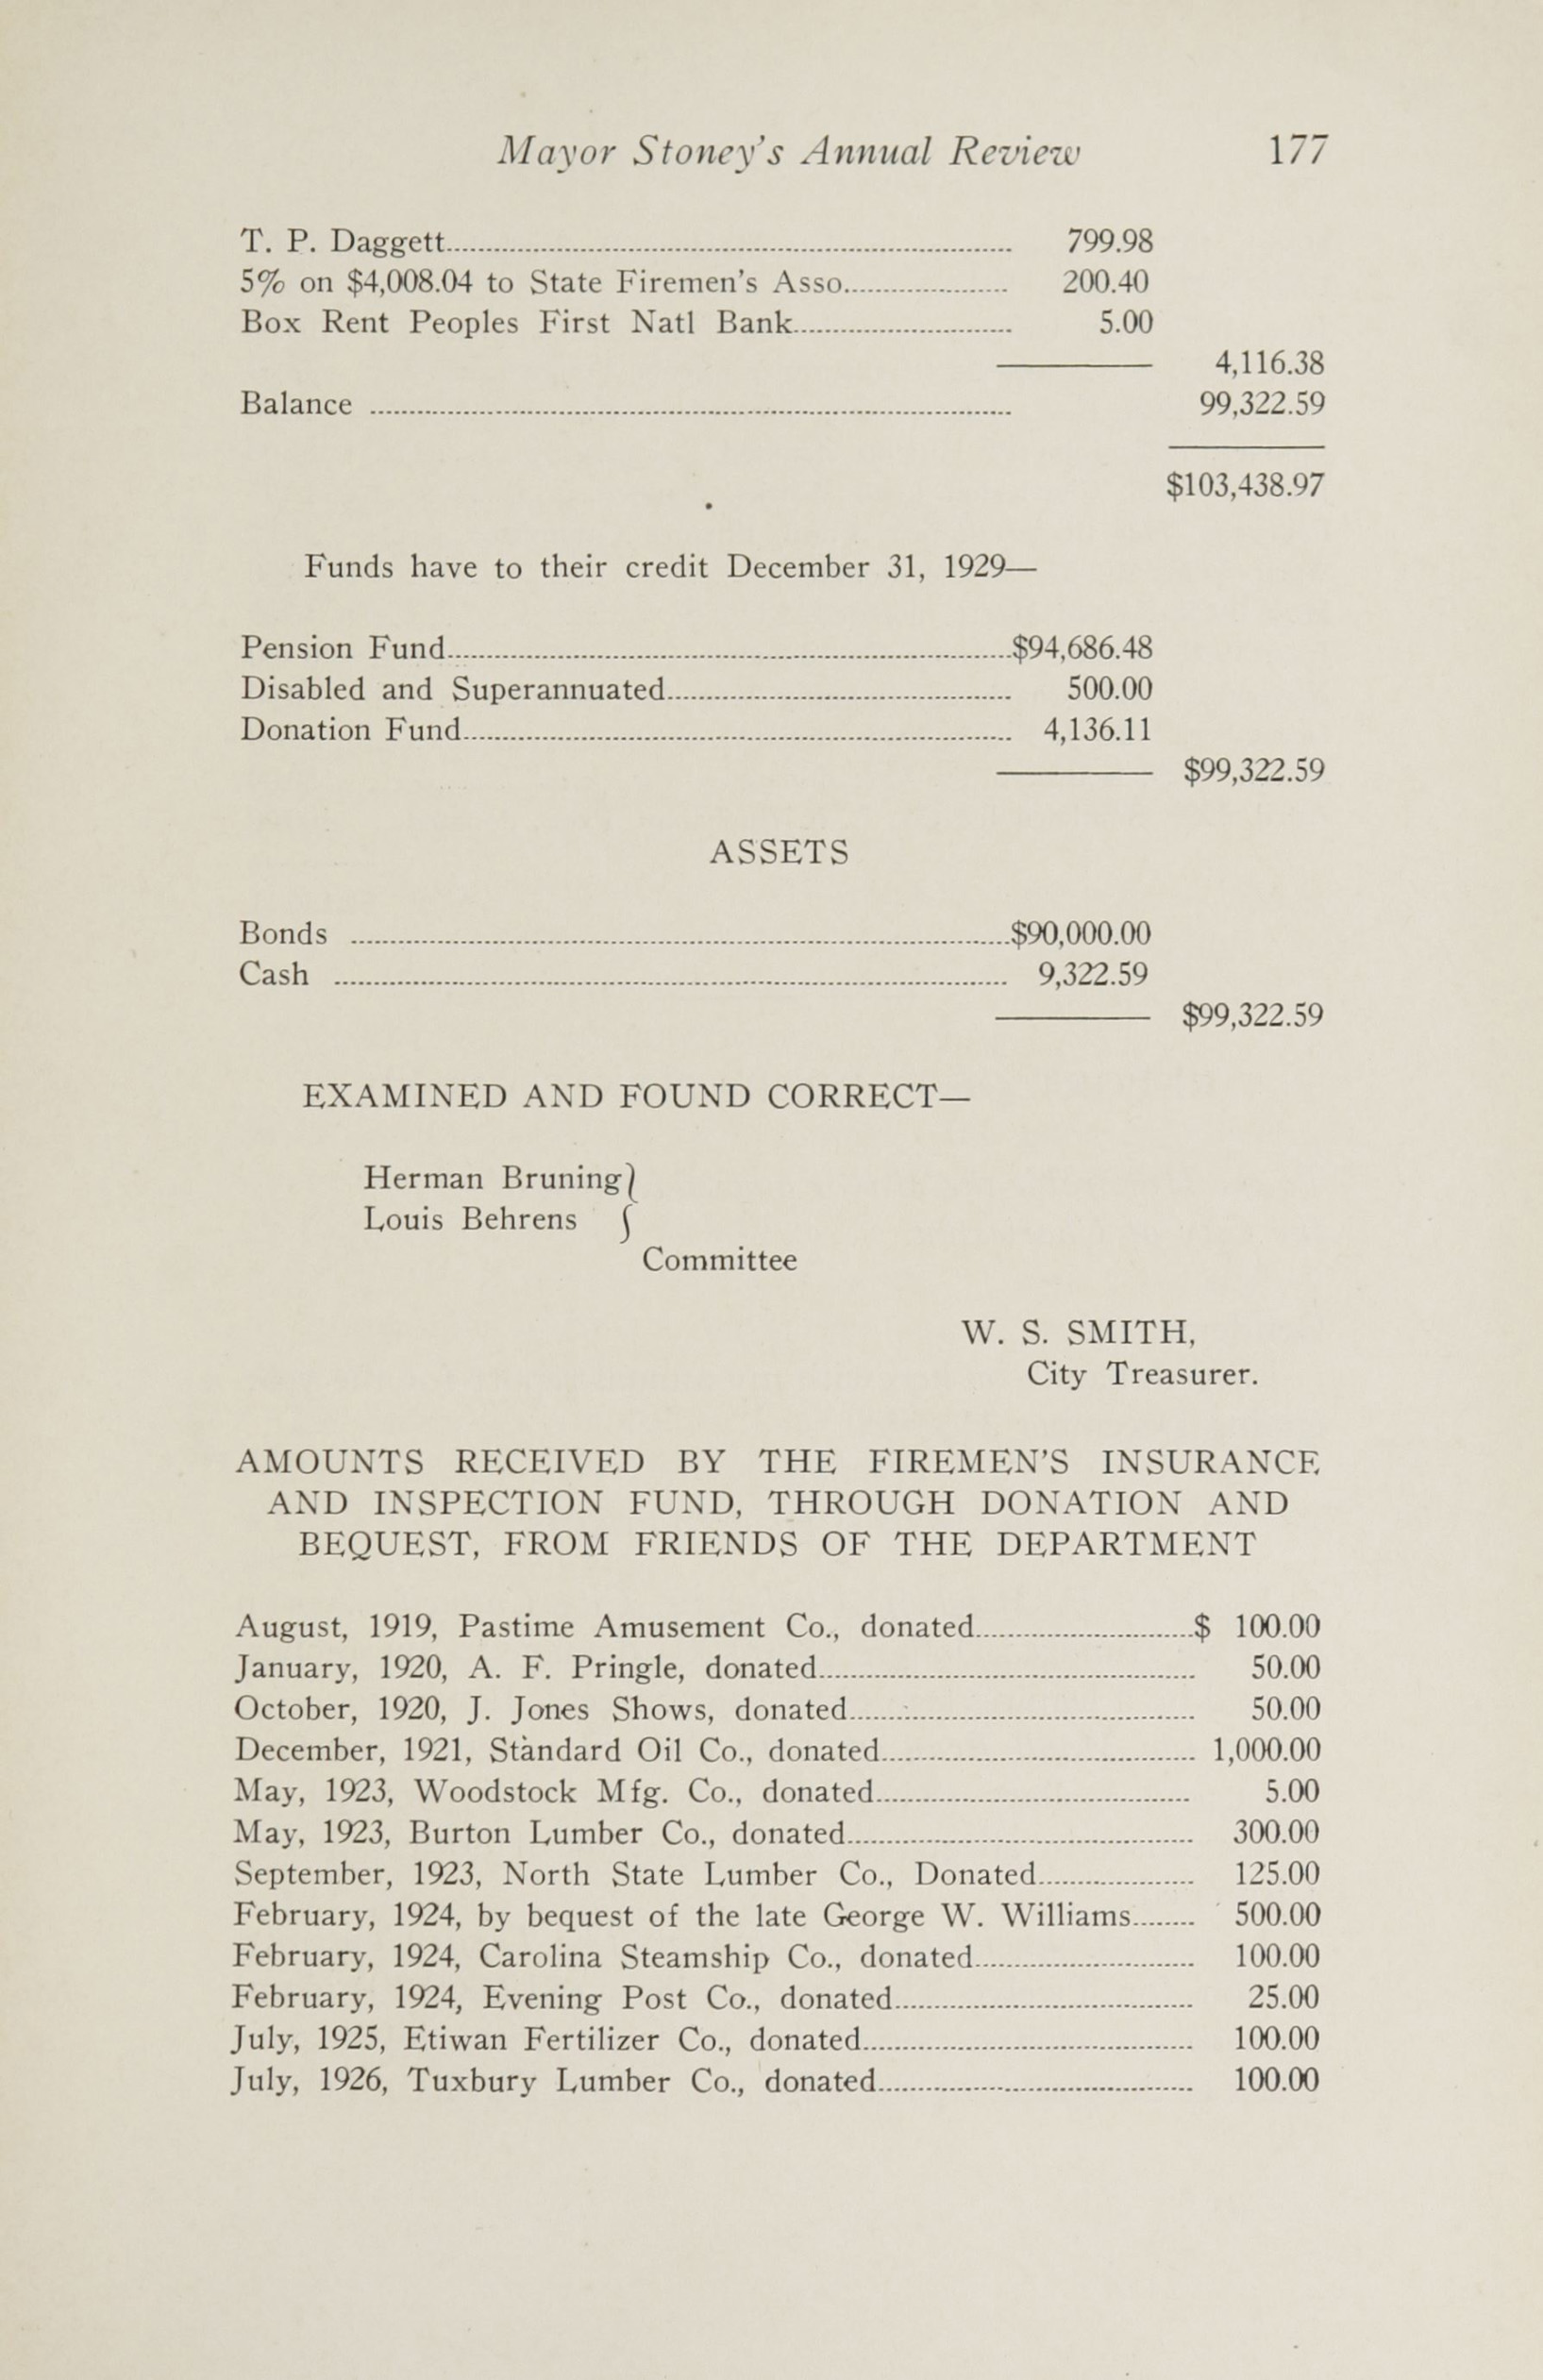 Charleston Yearbook, 1929, page 177